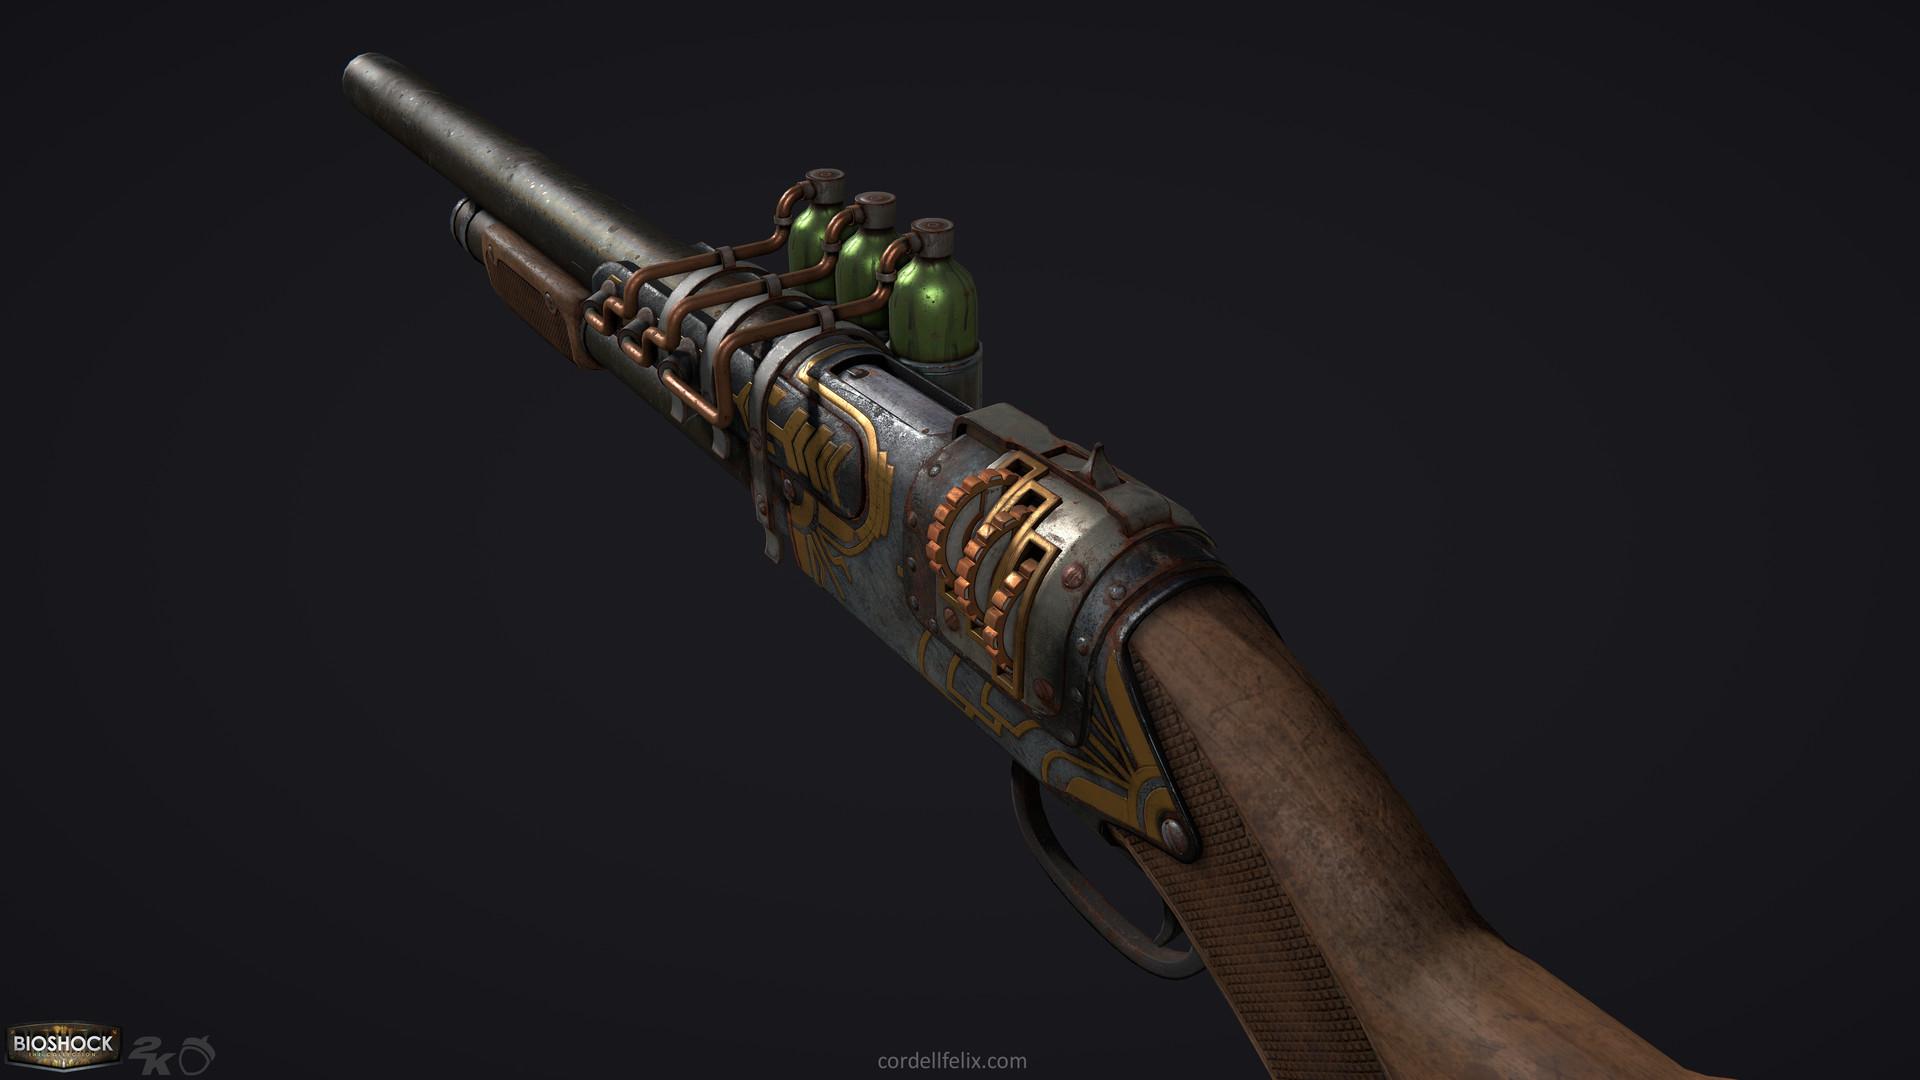 Cordell felix cordellfelix shotgun 04